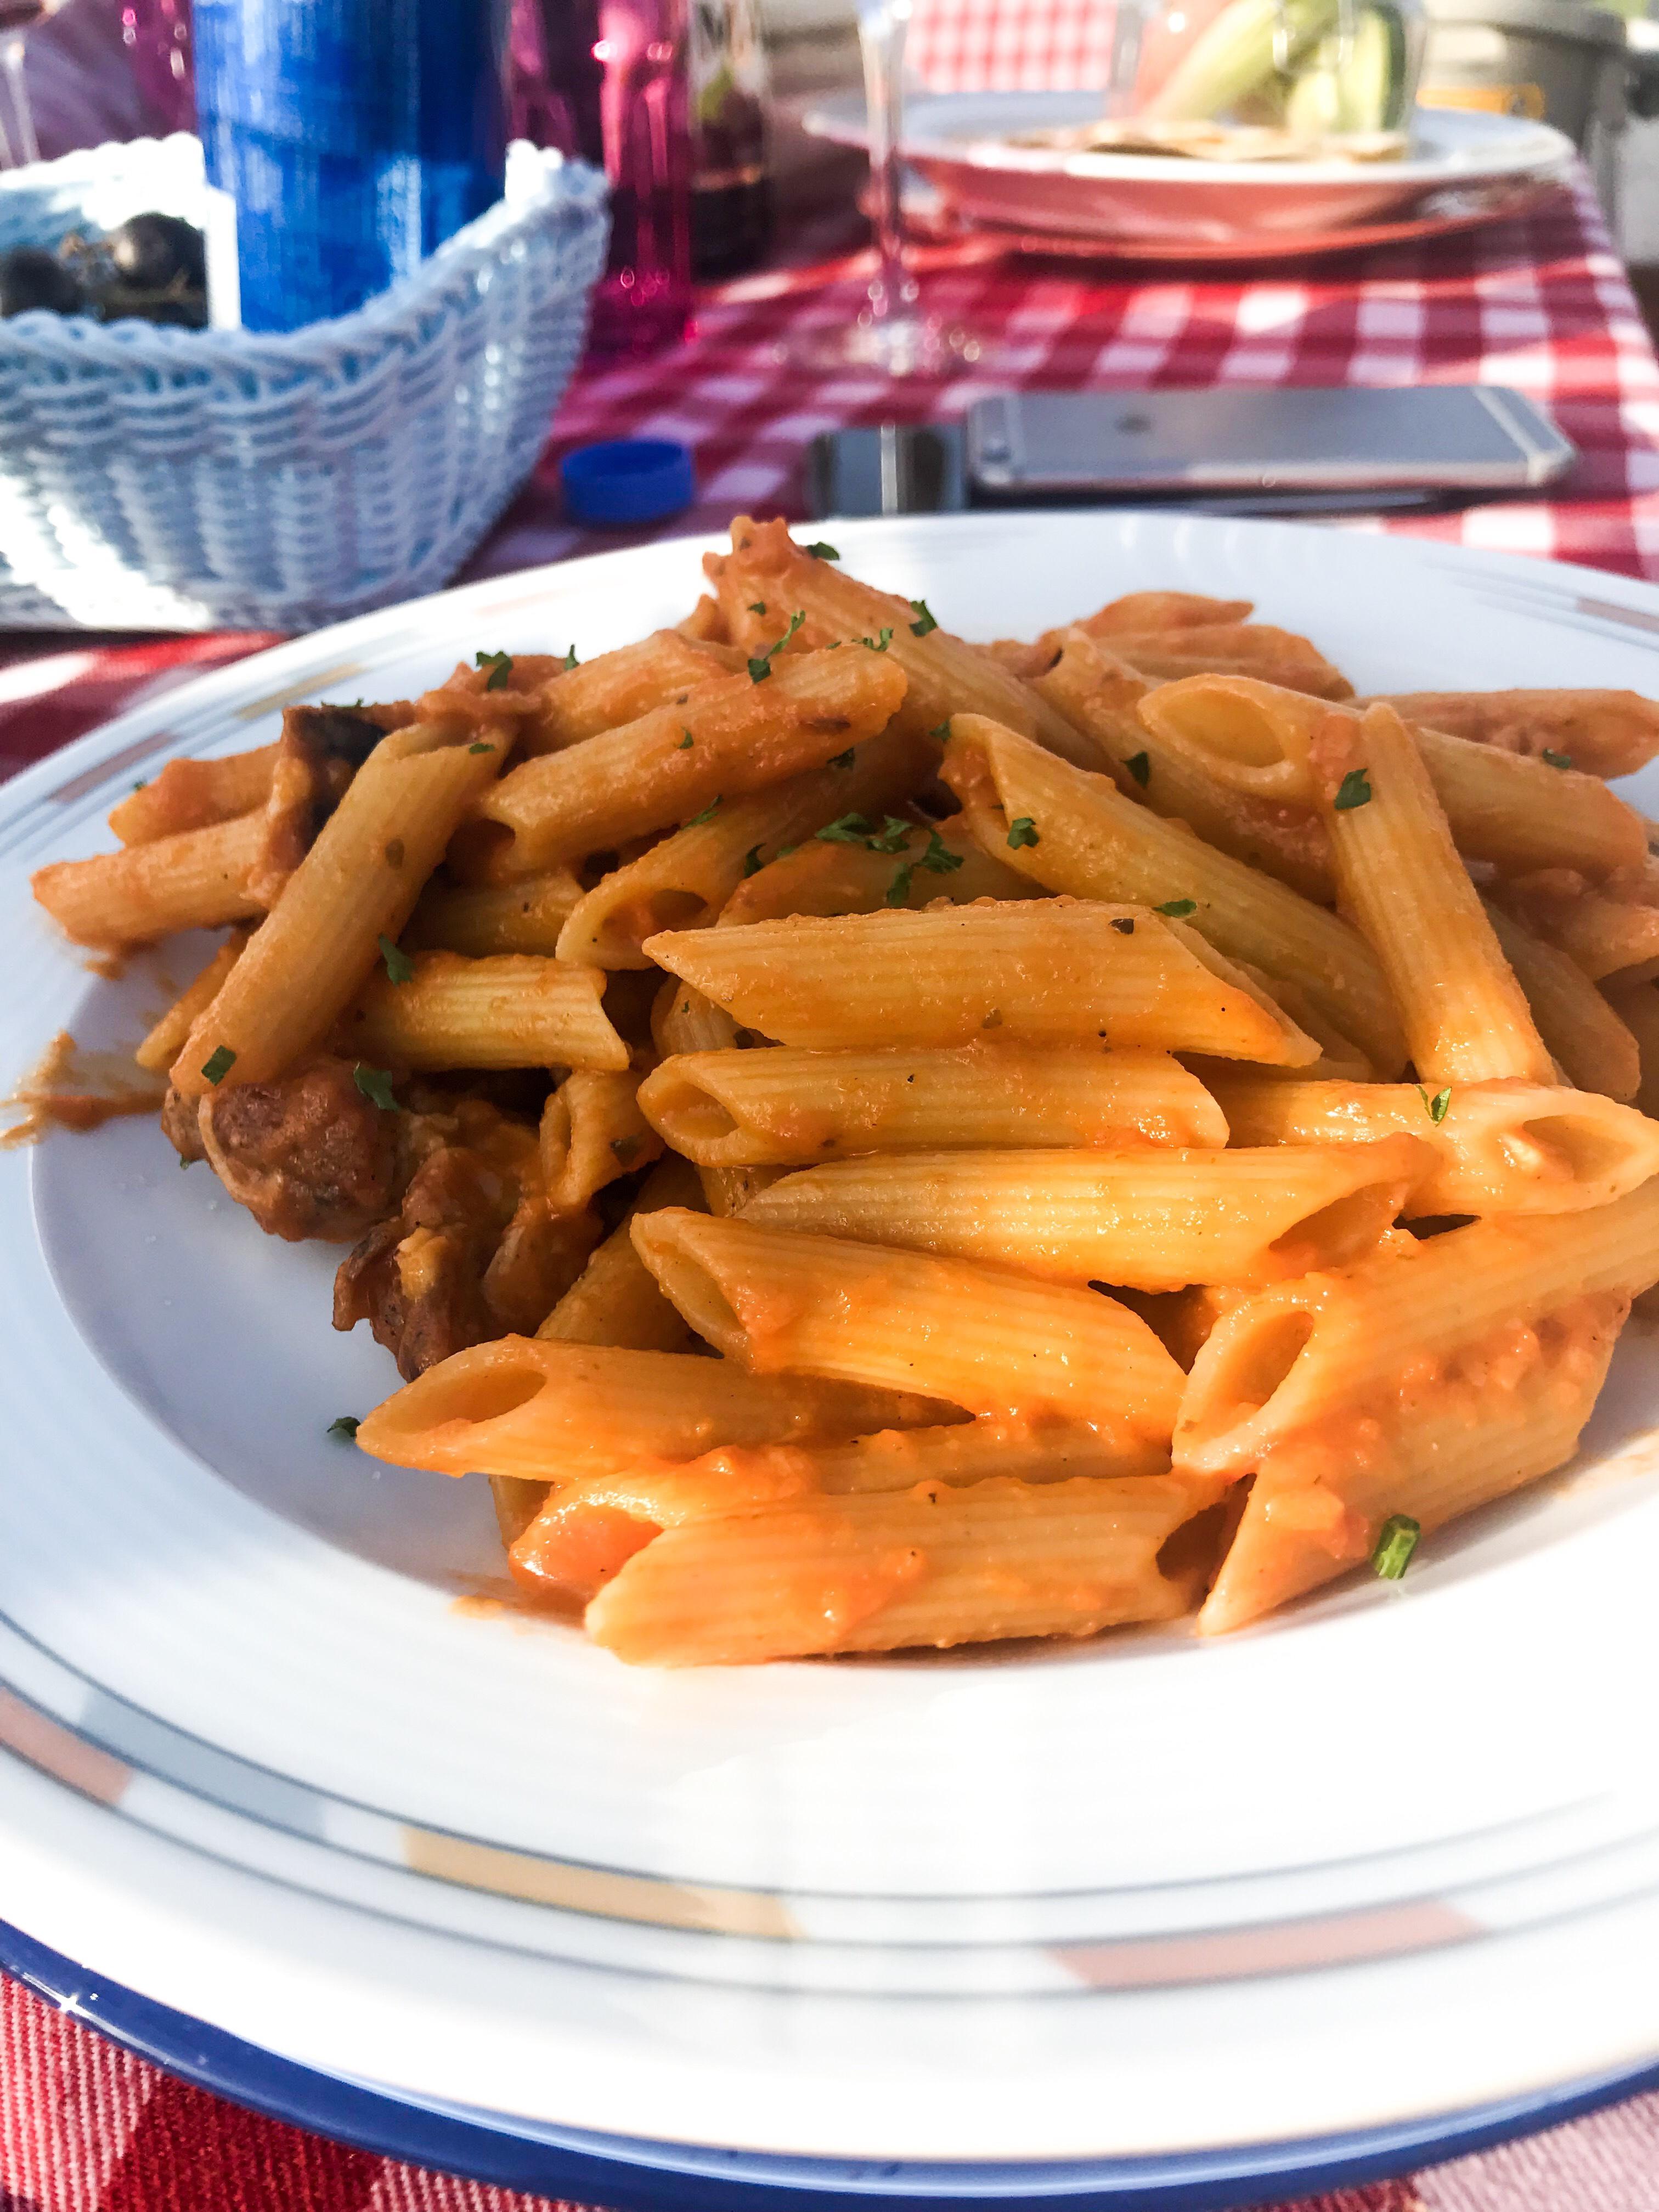 Super delicious pasta